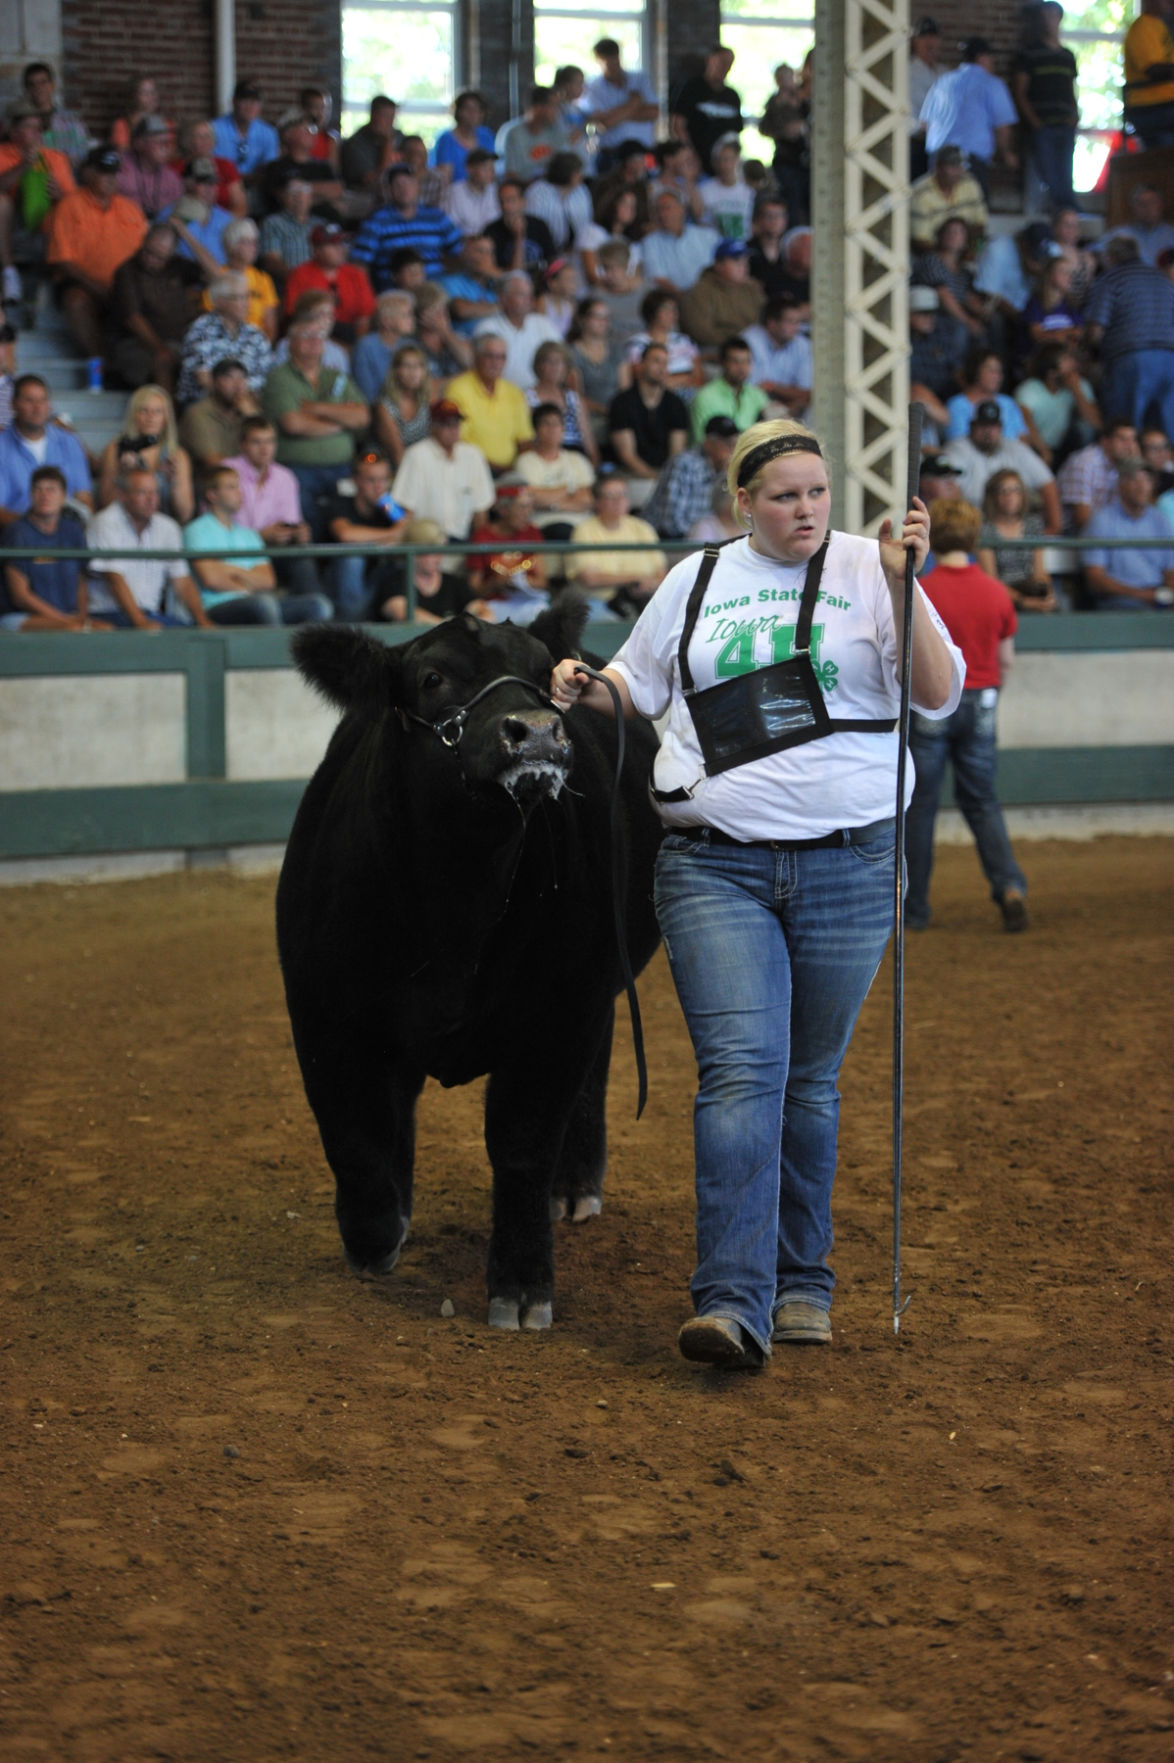 Iowa State Fair Livestock Crops Results News